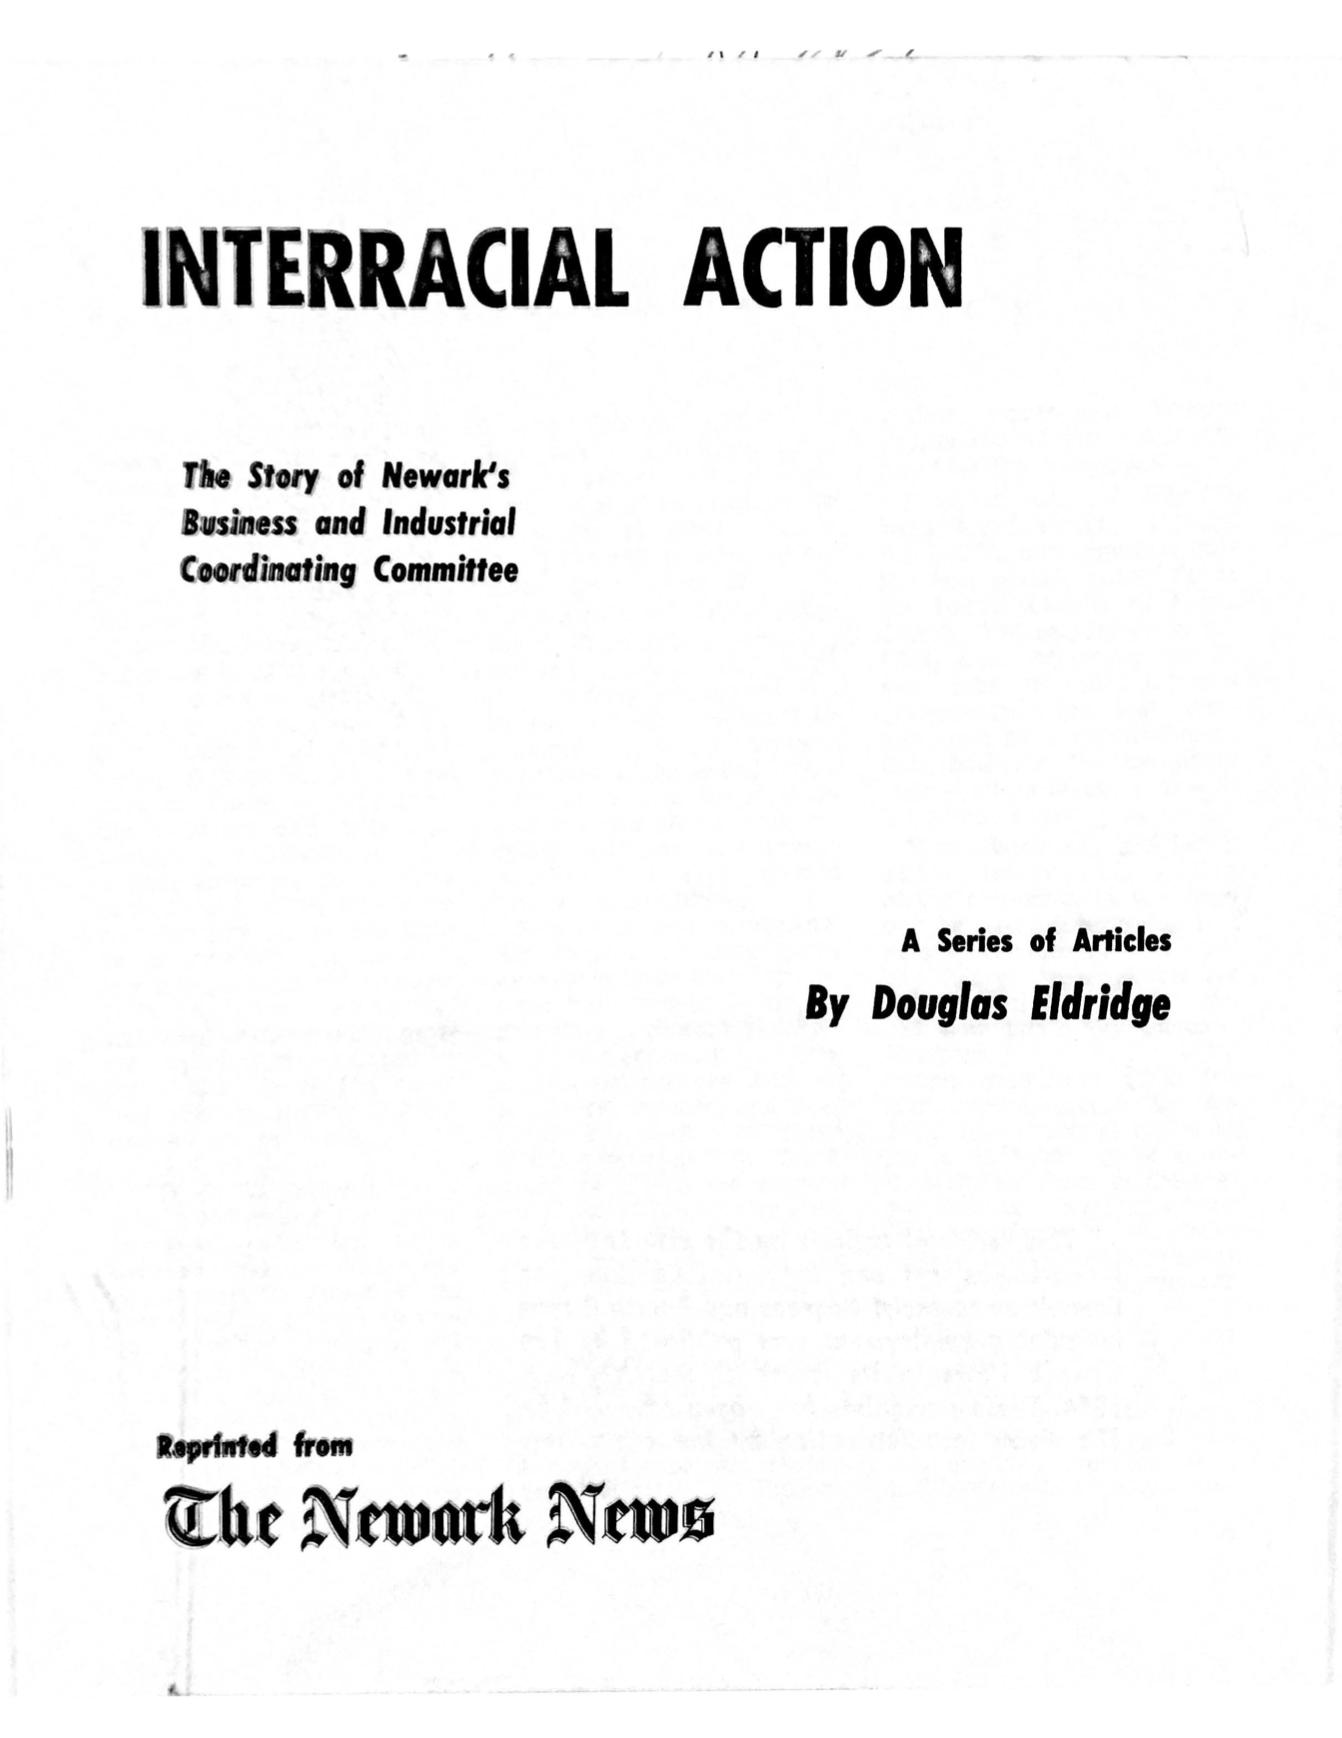 Interracial Action- The Story of Newark's BICC, by Douglas Eldridge